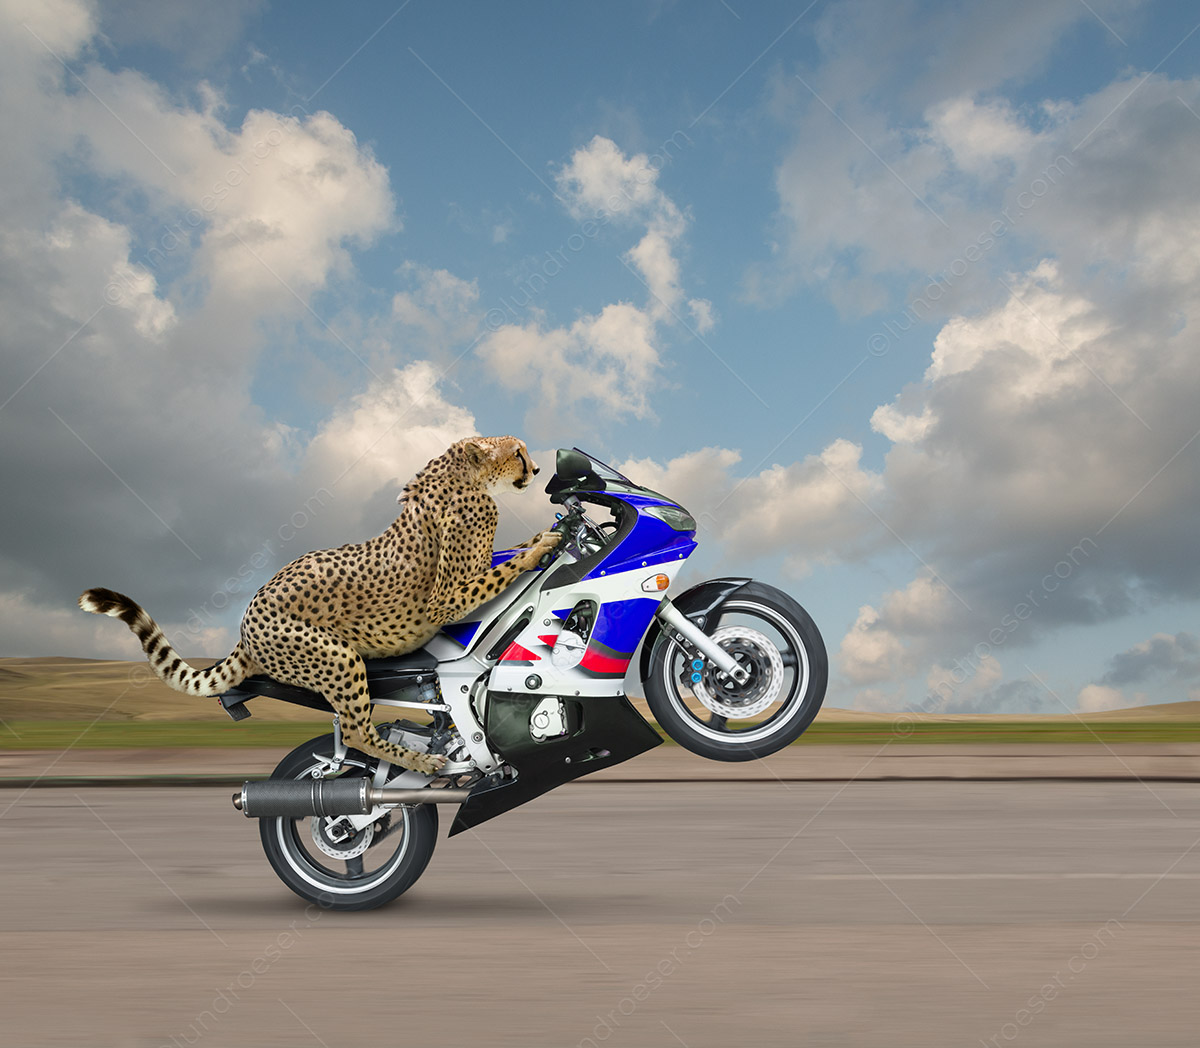 Fastest_Animal_Cheetah